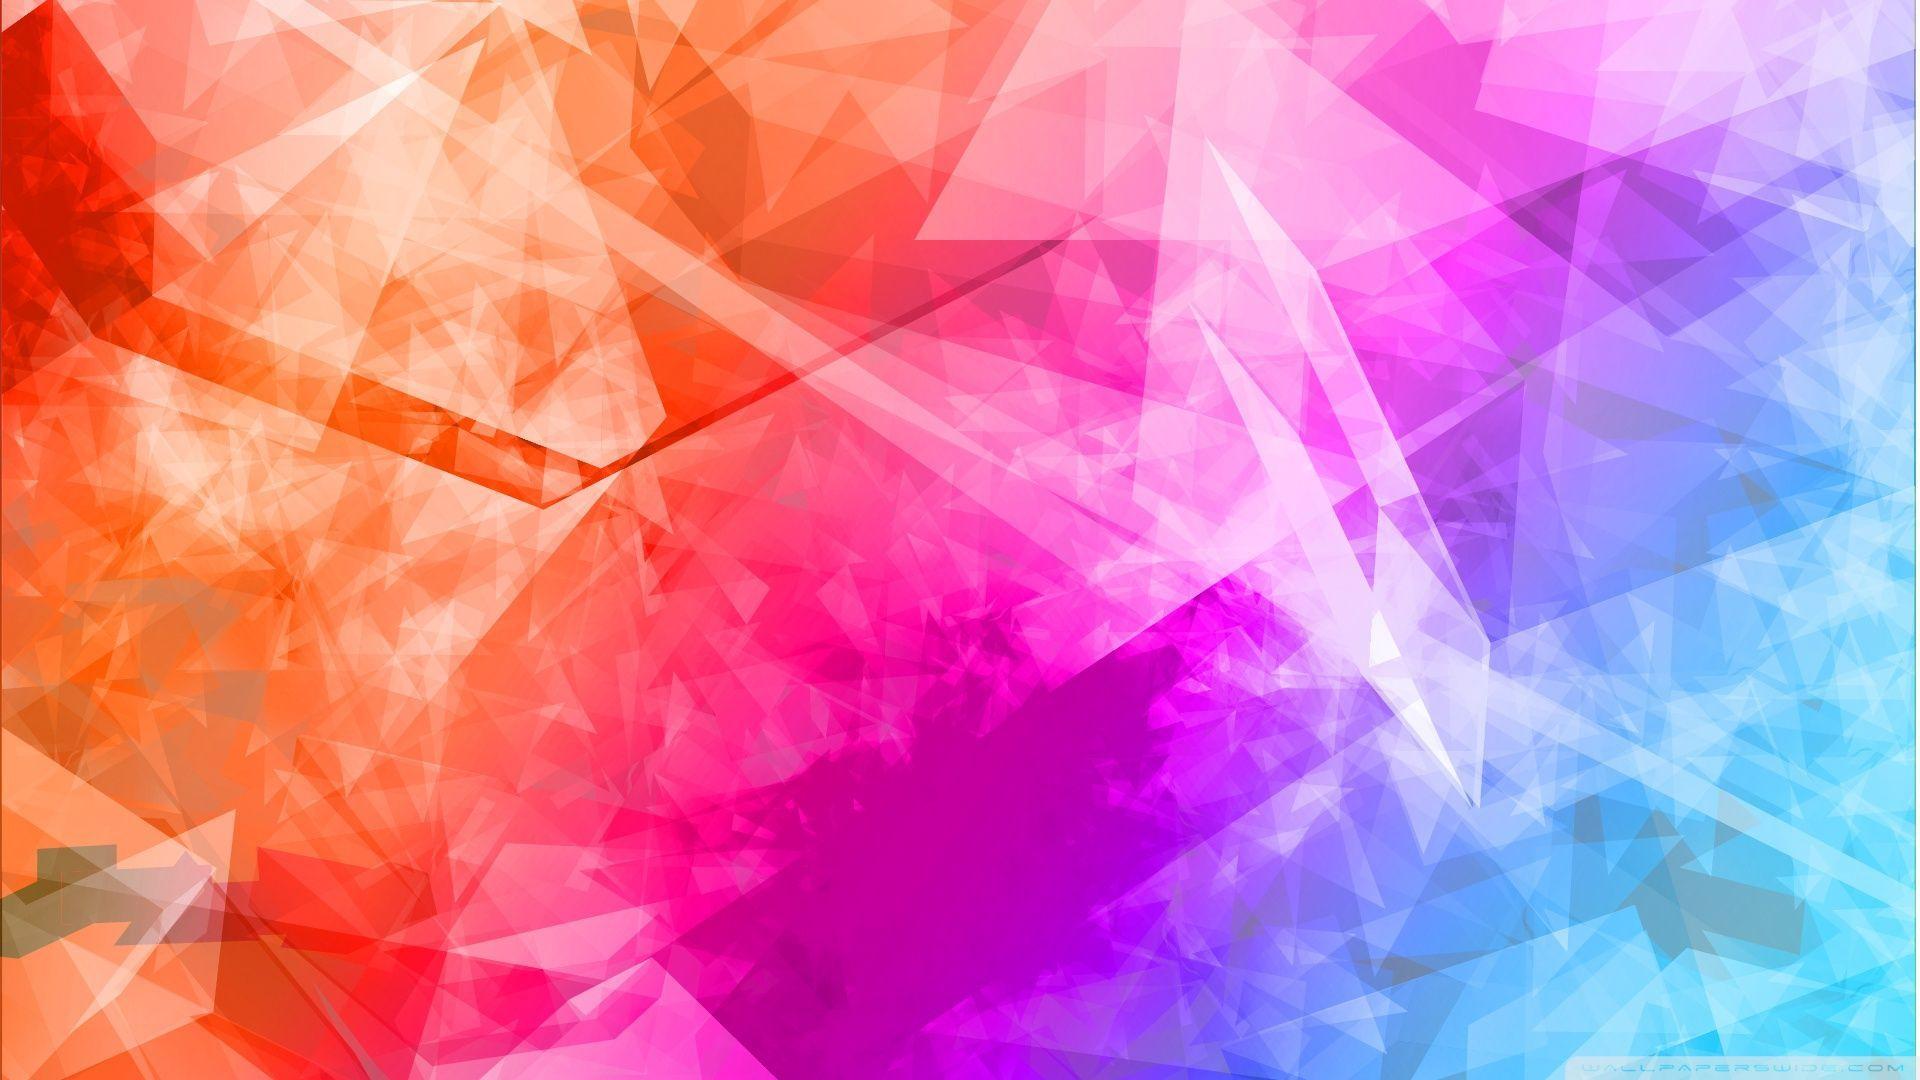 Bright full screen hd wallpaper